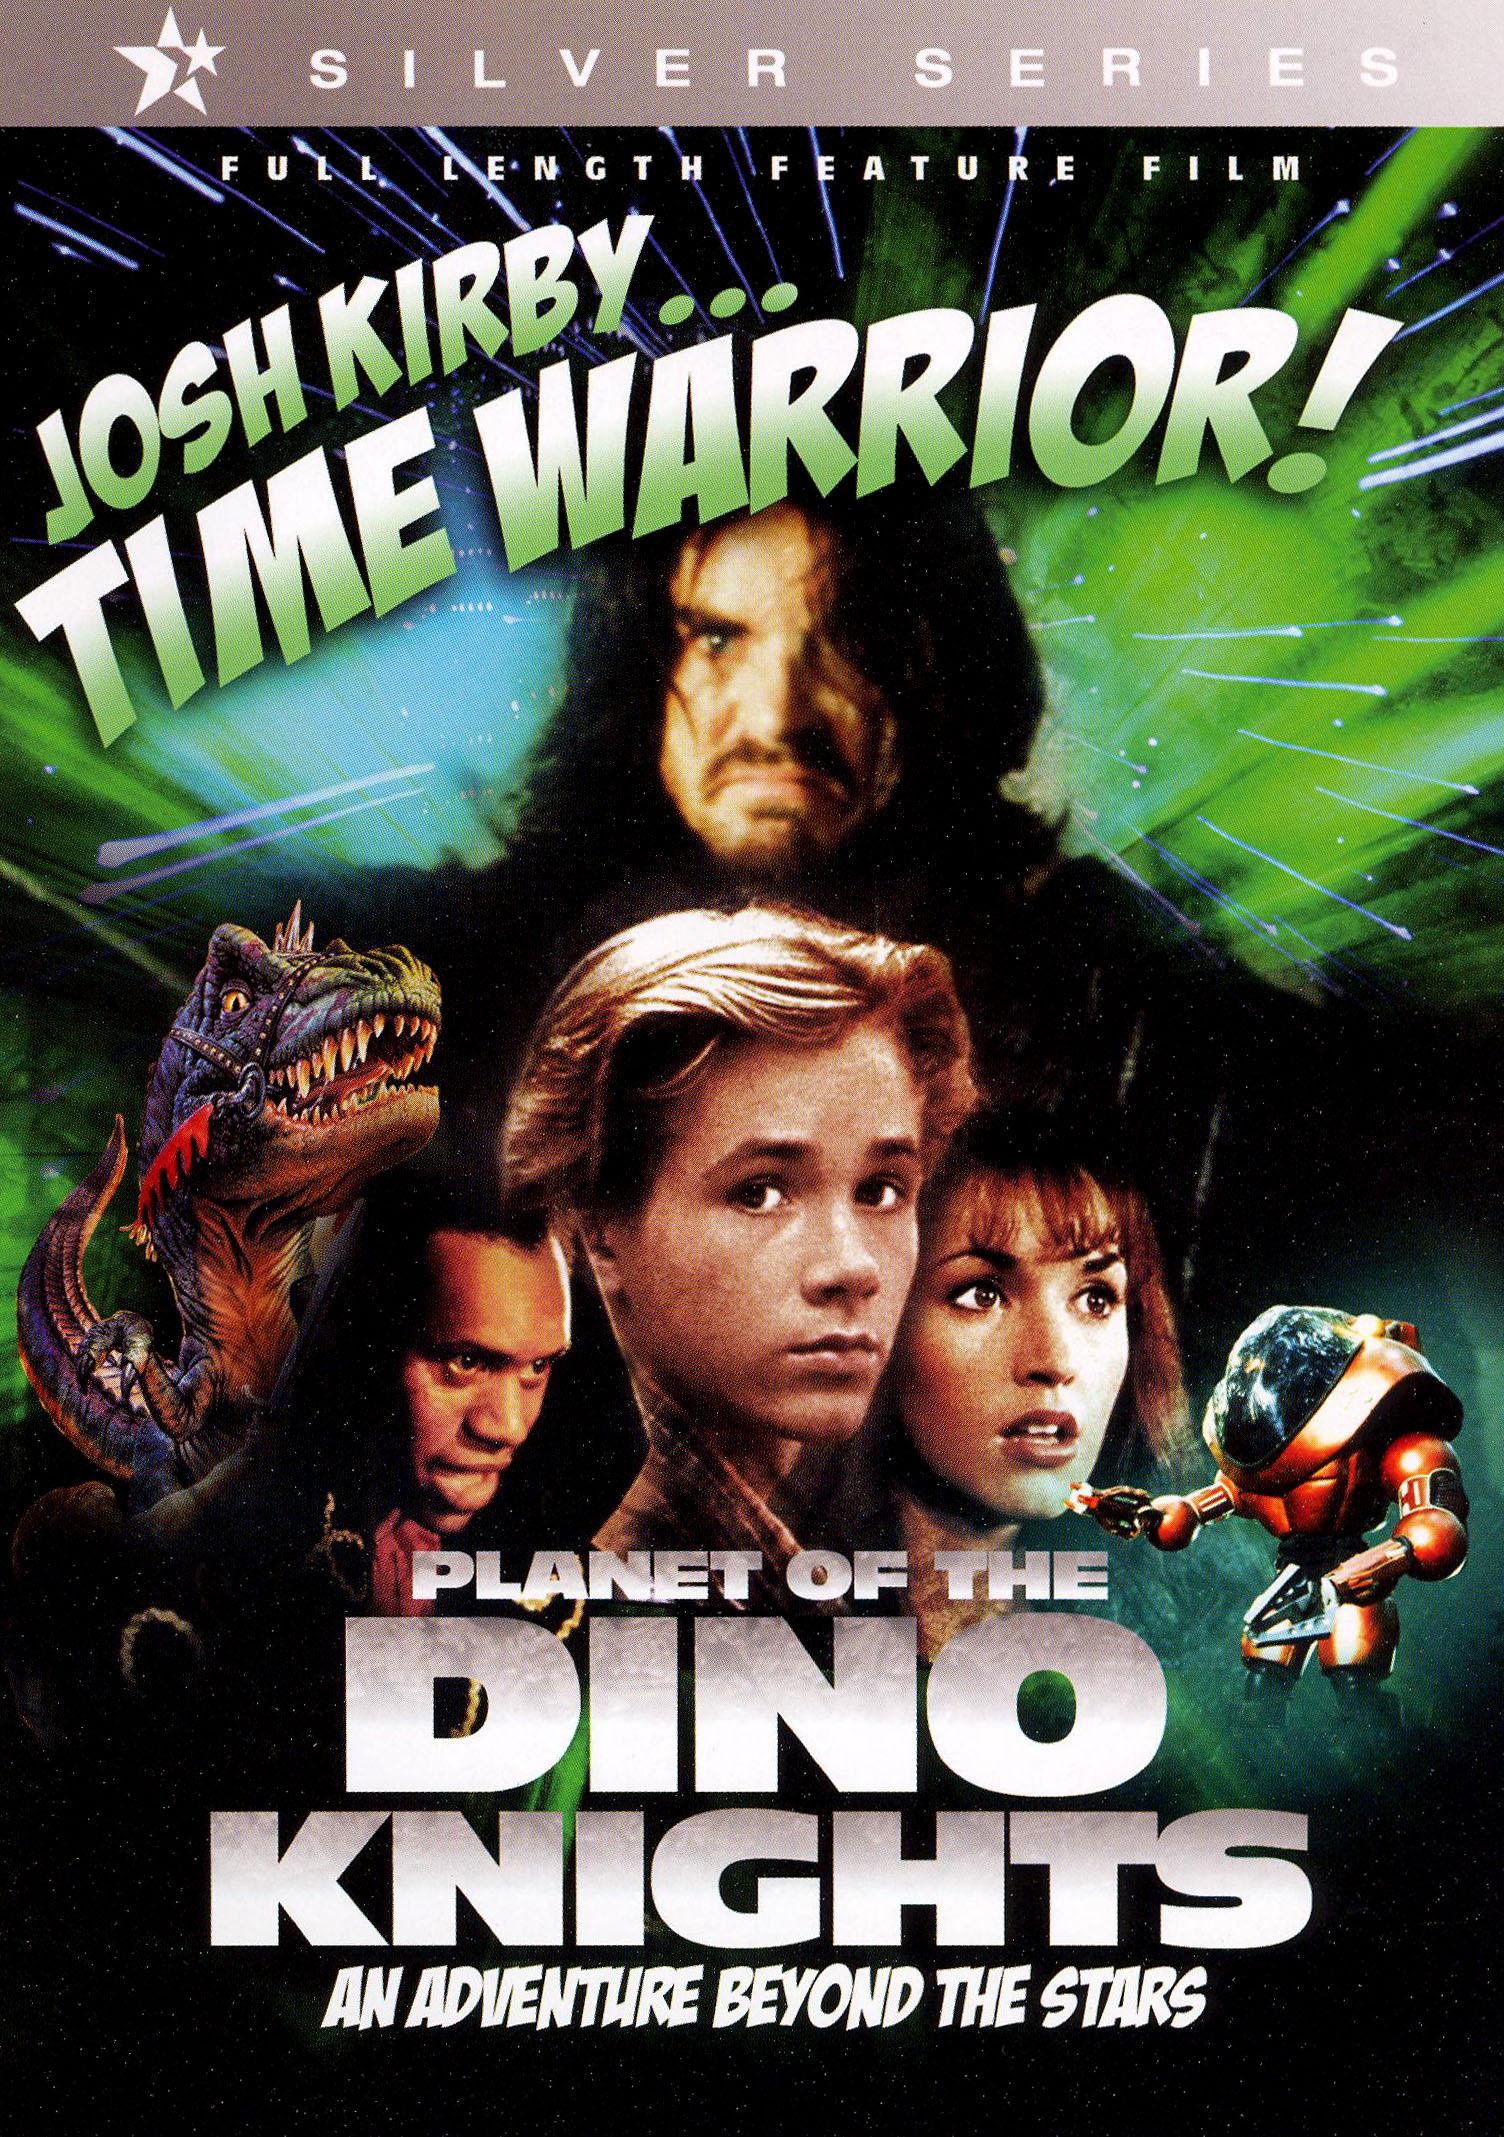 Josh Kirby...Time Warrior!: Dino Knights